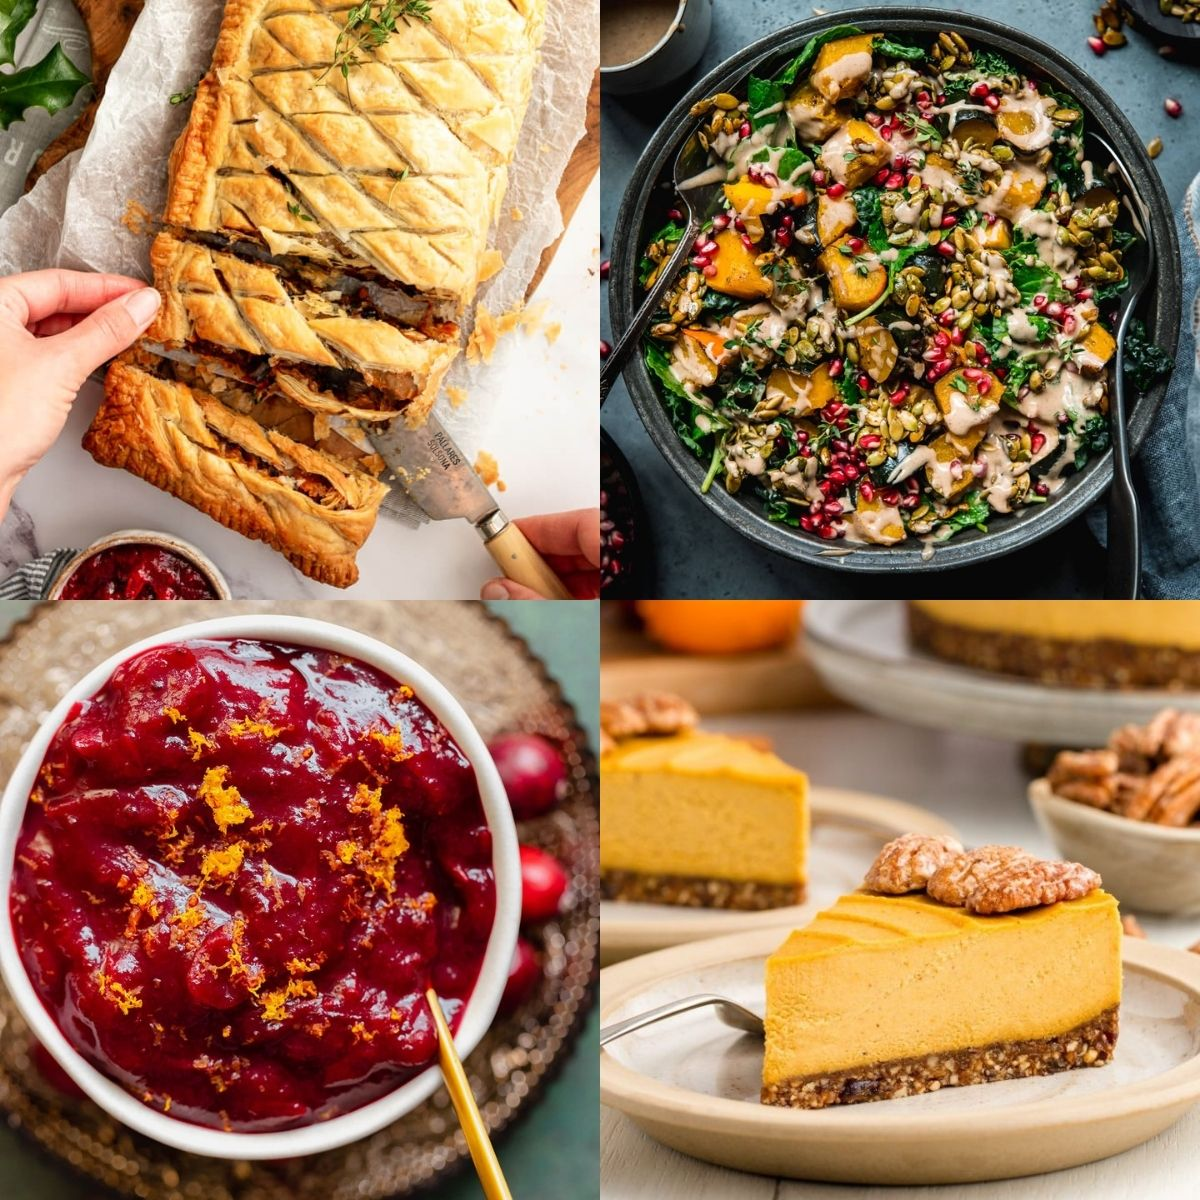 Four Thanksgiving food recipes, mushroom wellington, cranberry sauce, salad, and pie.